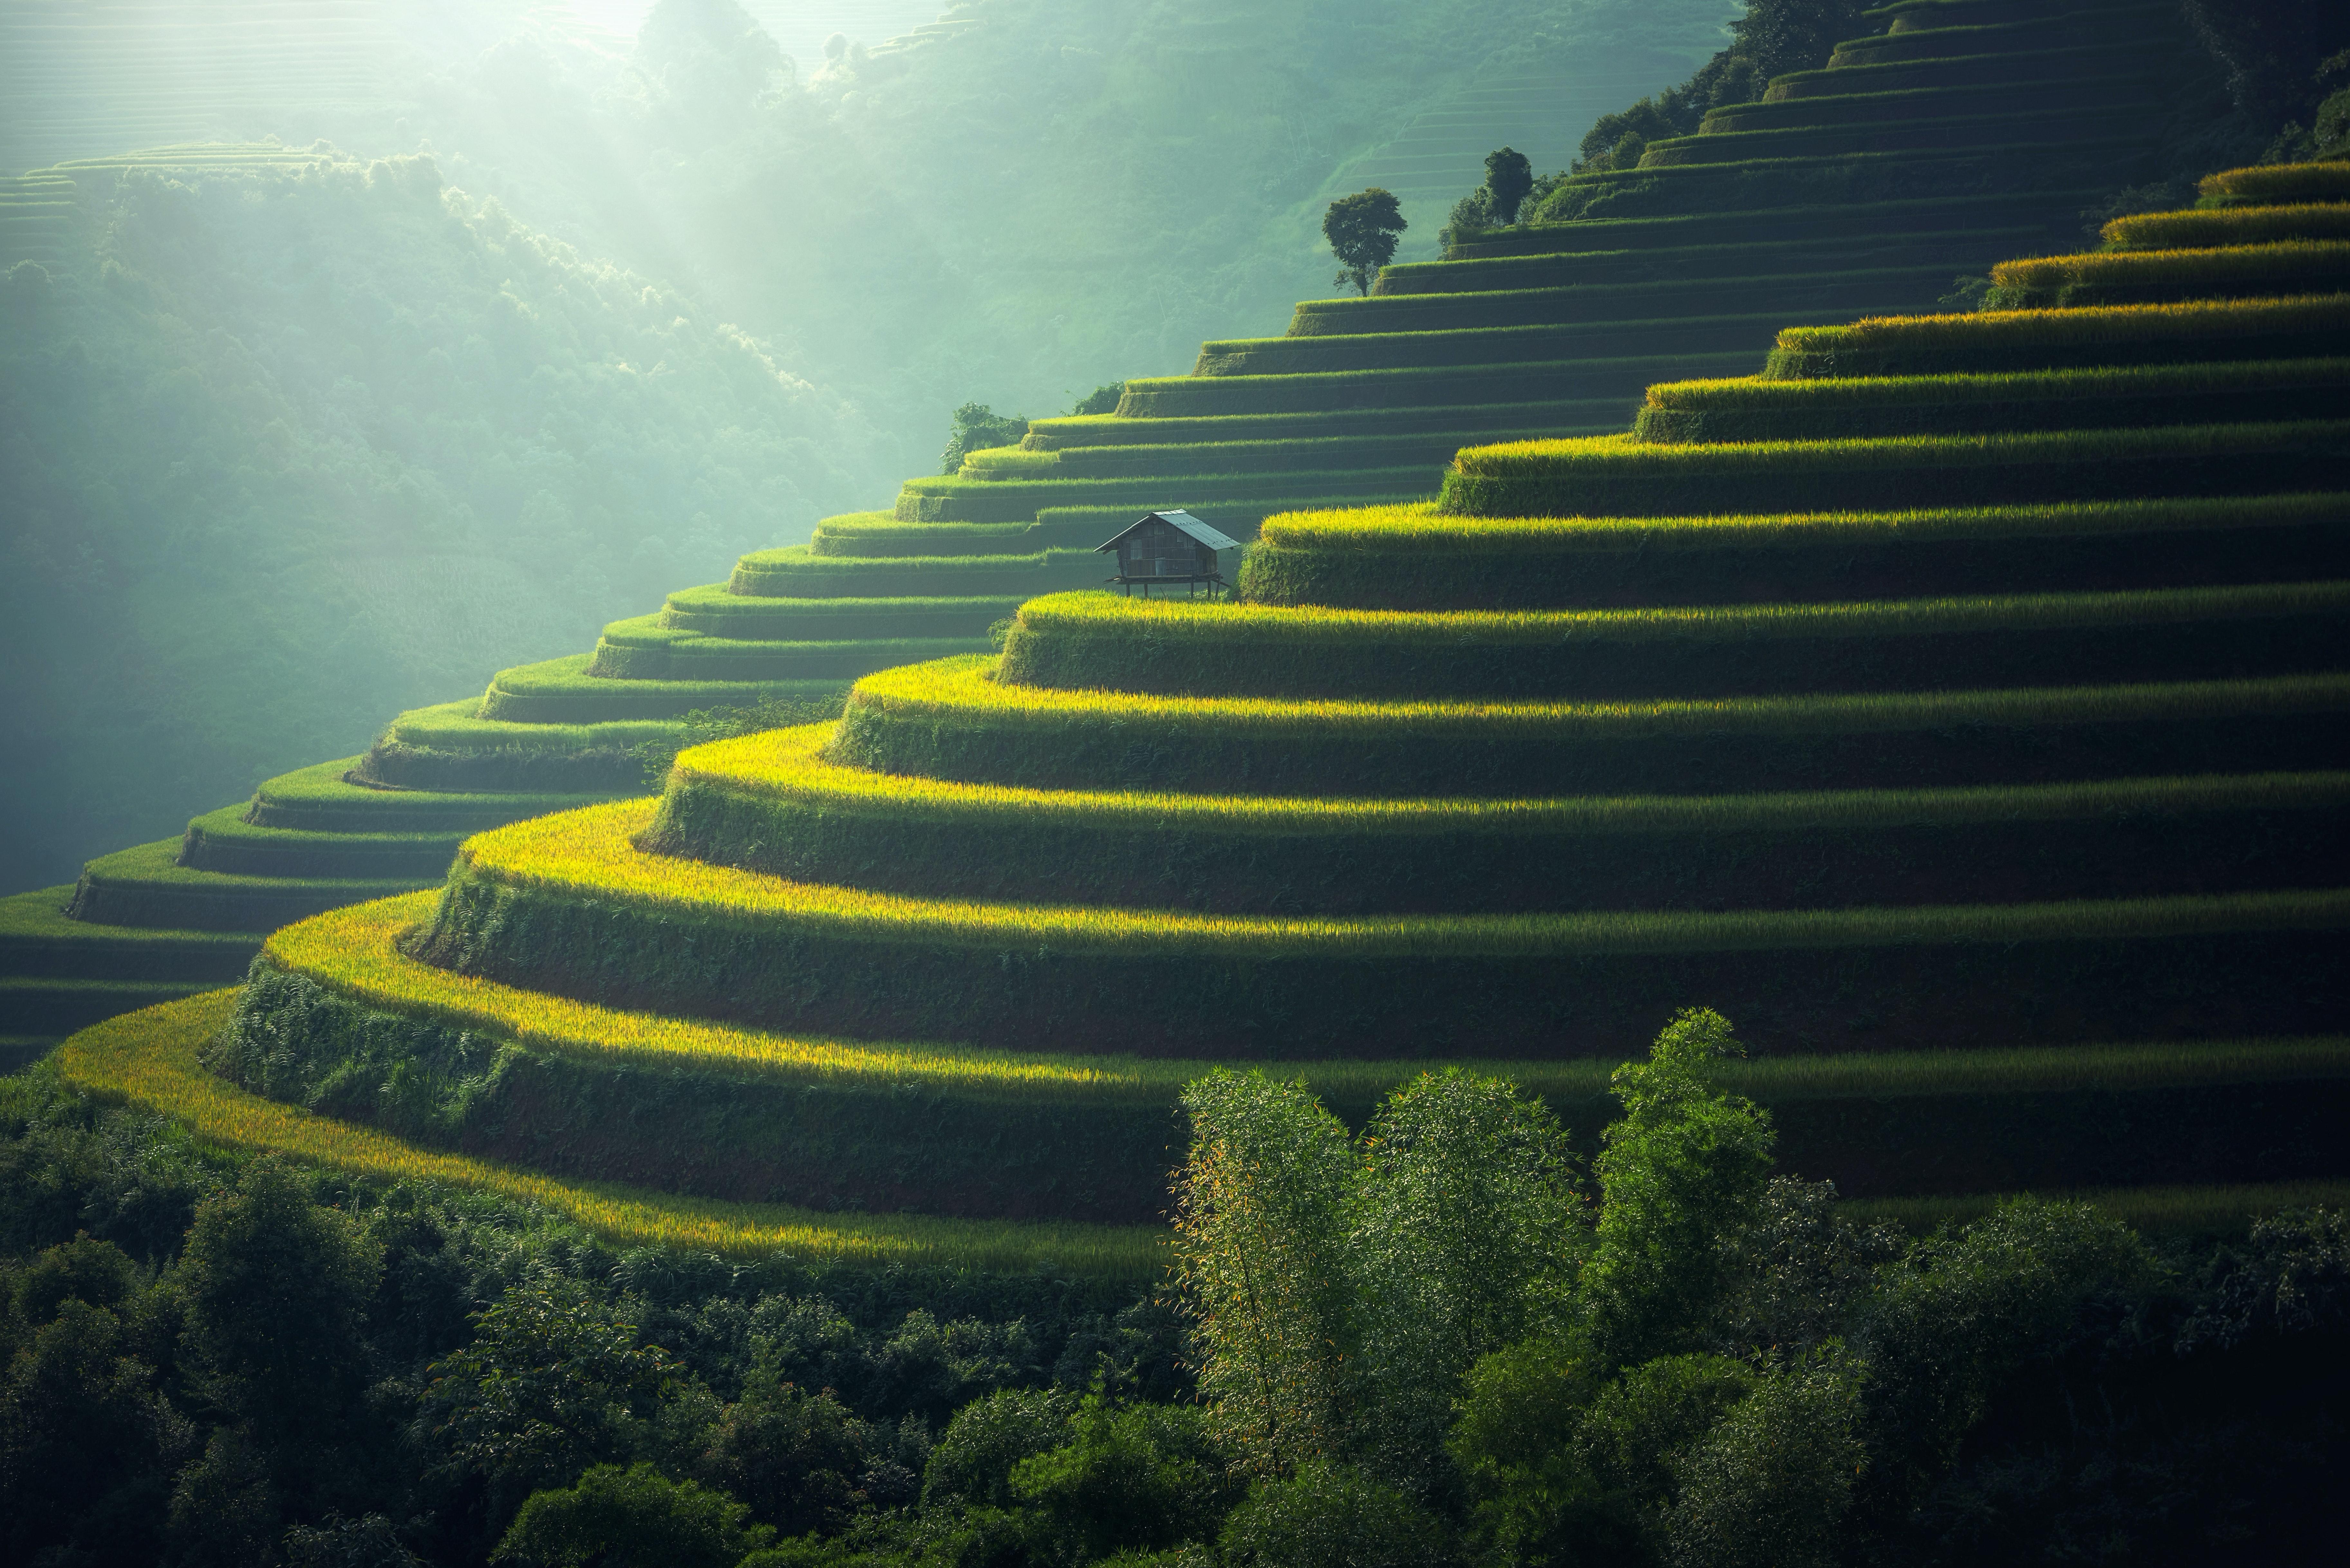 landscape pictures pexels free stock photos